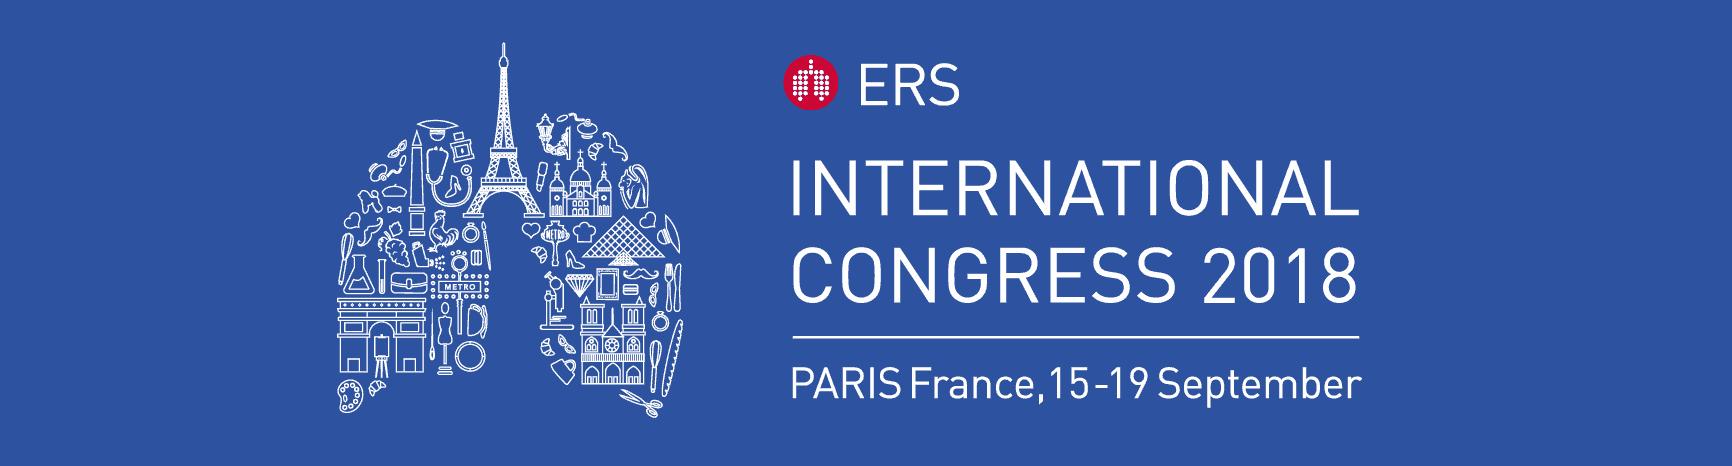 emka and SCIREQ at ERS 2018 in Paris